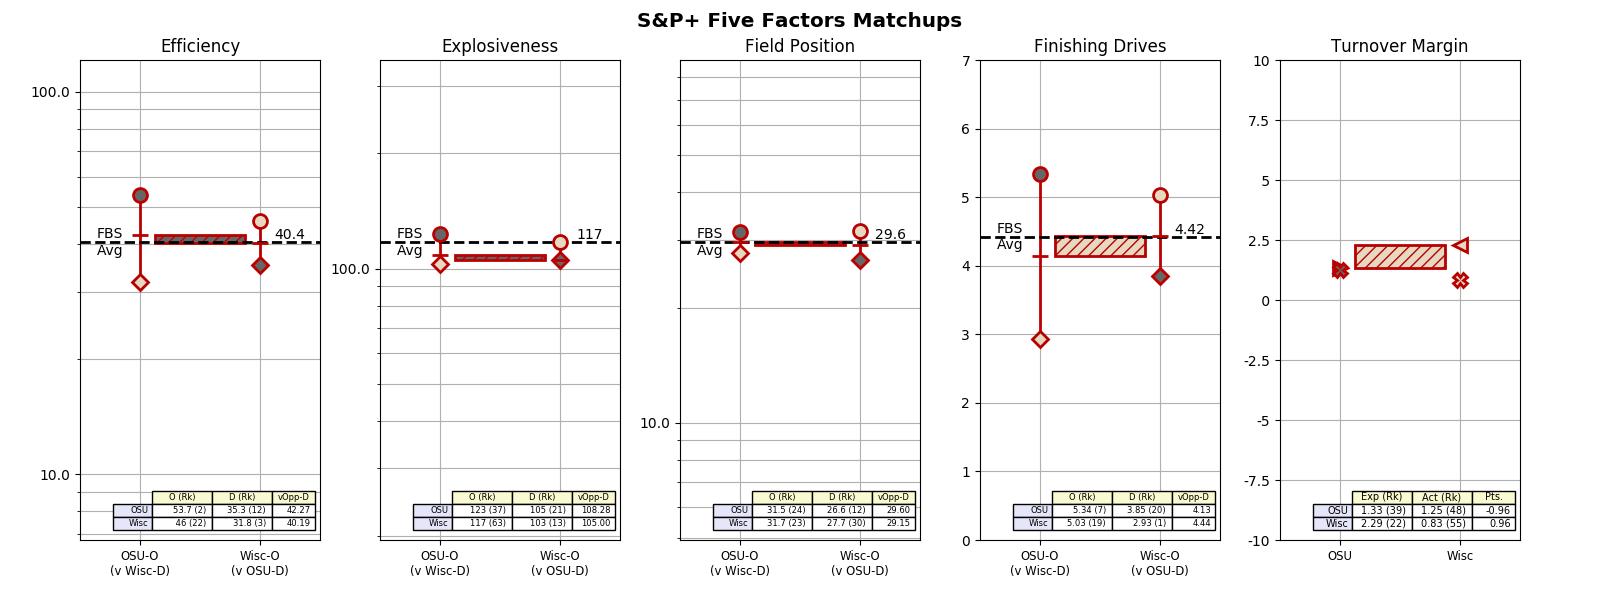 2017w14_OSU_Wisc_5factors_matchup